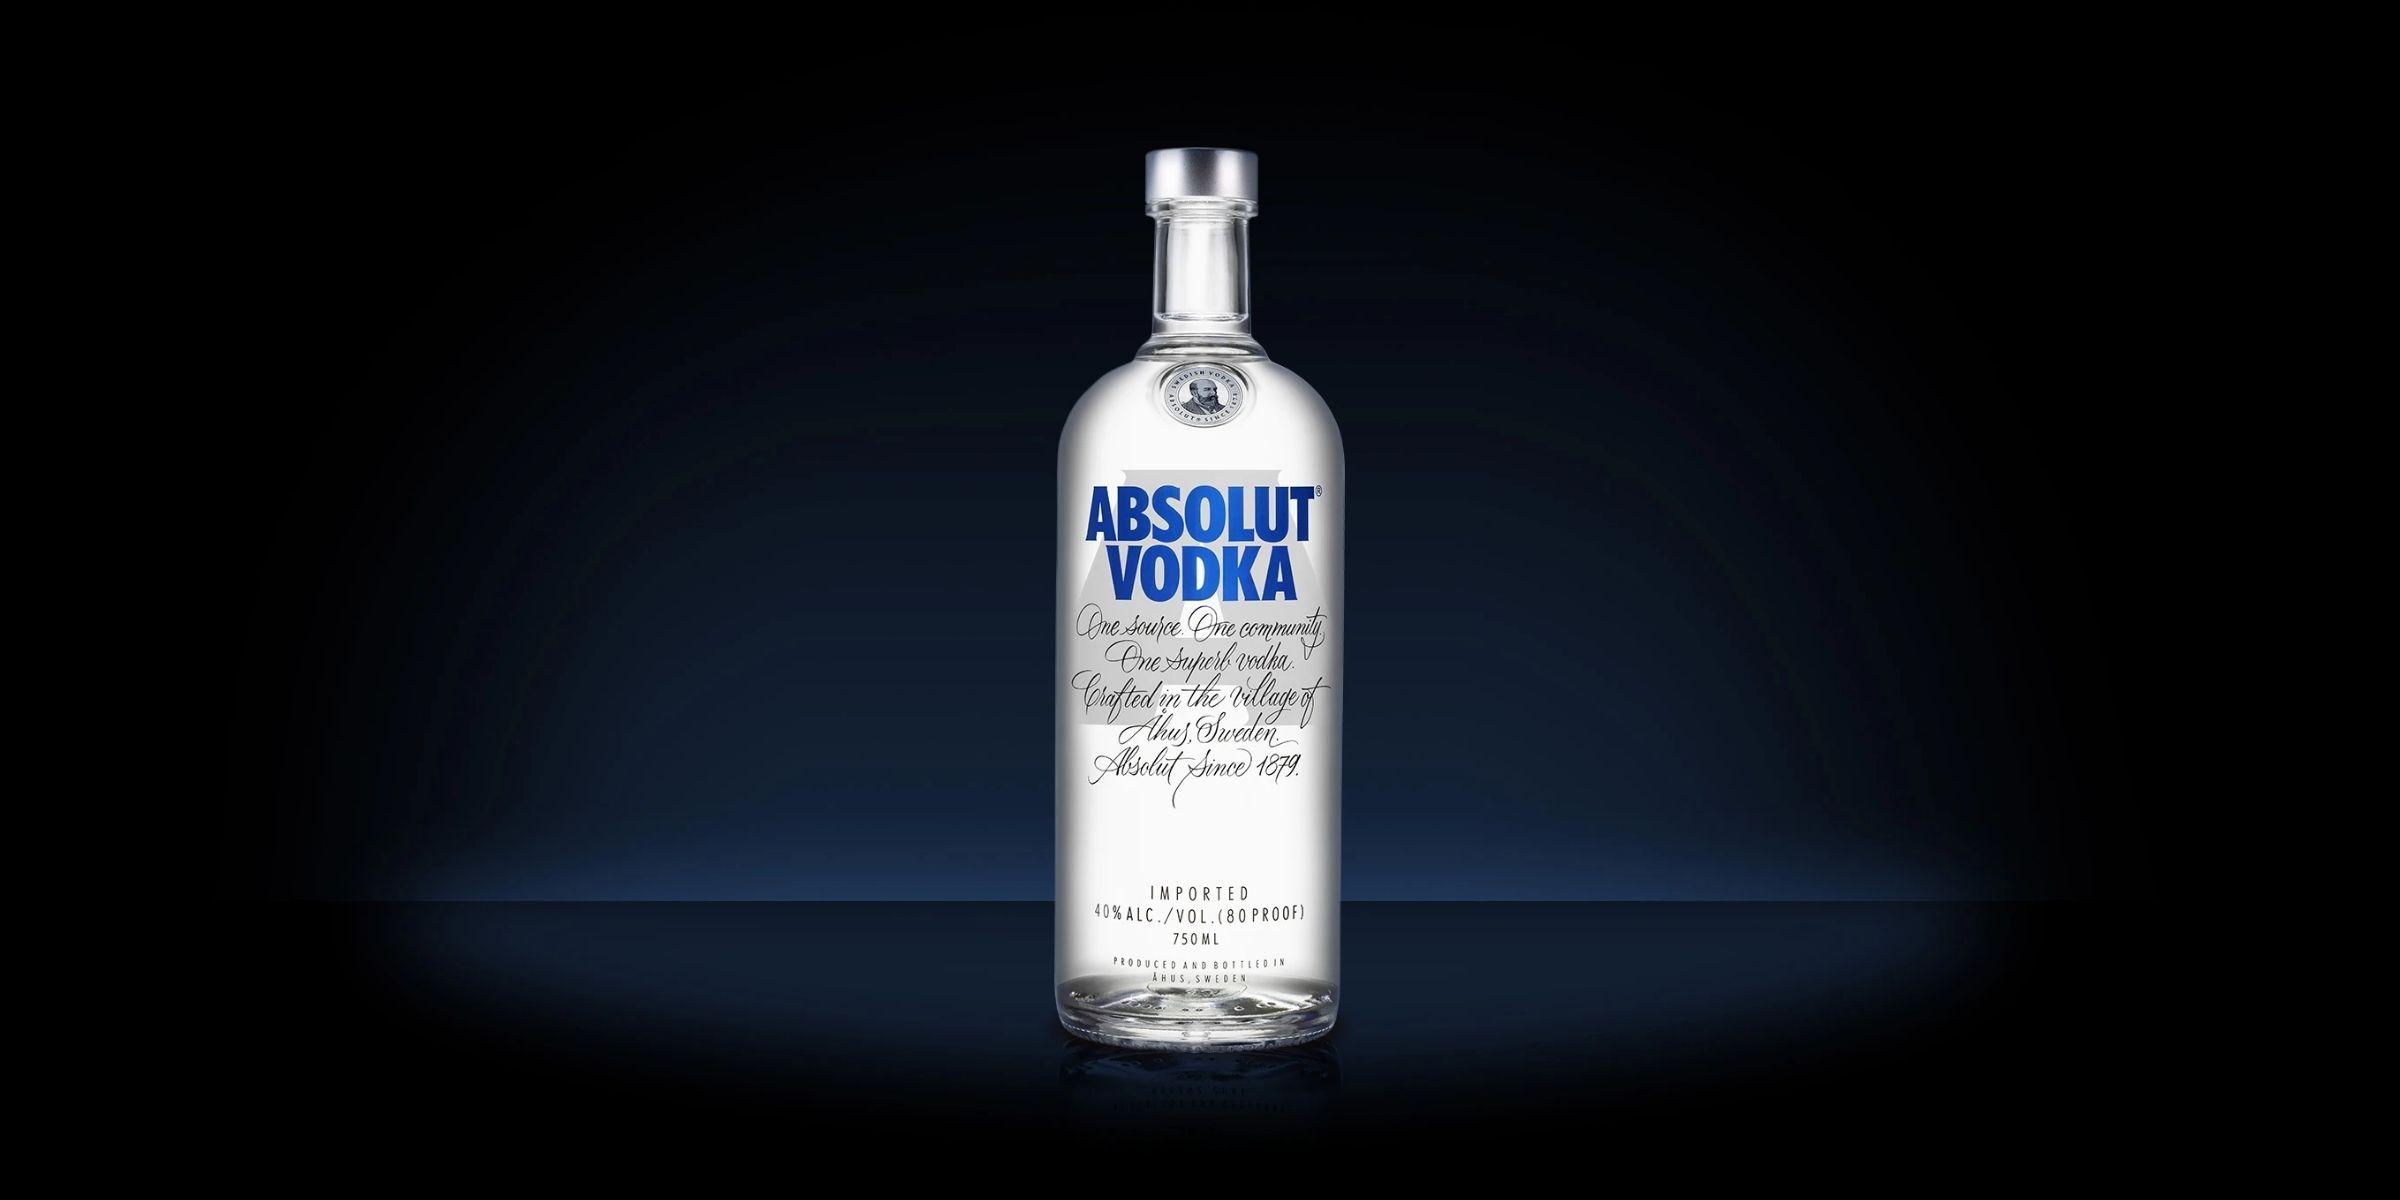 Absolut Vodka Bottle Price Size - Luxe Digital